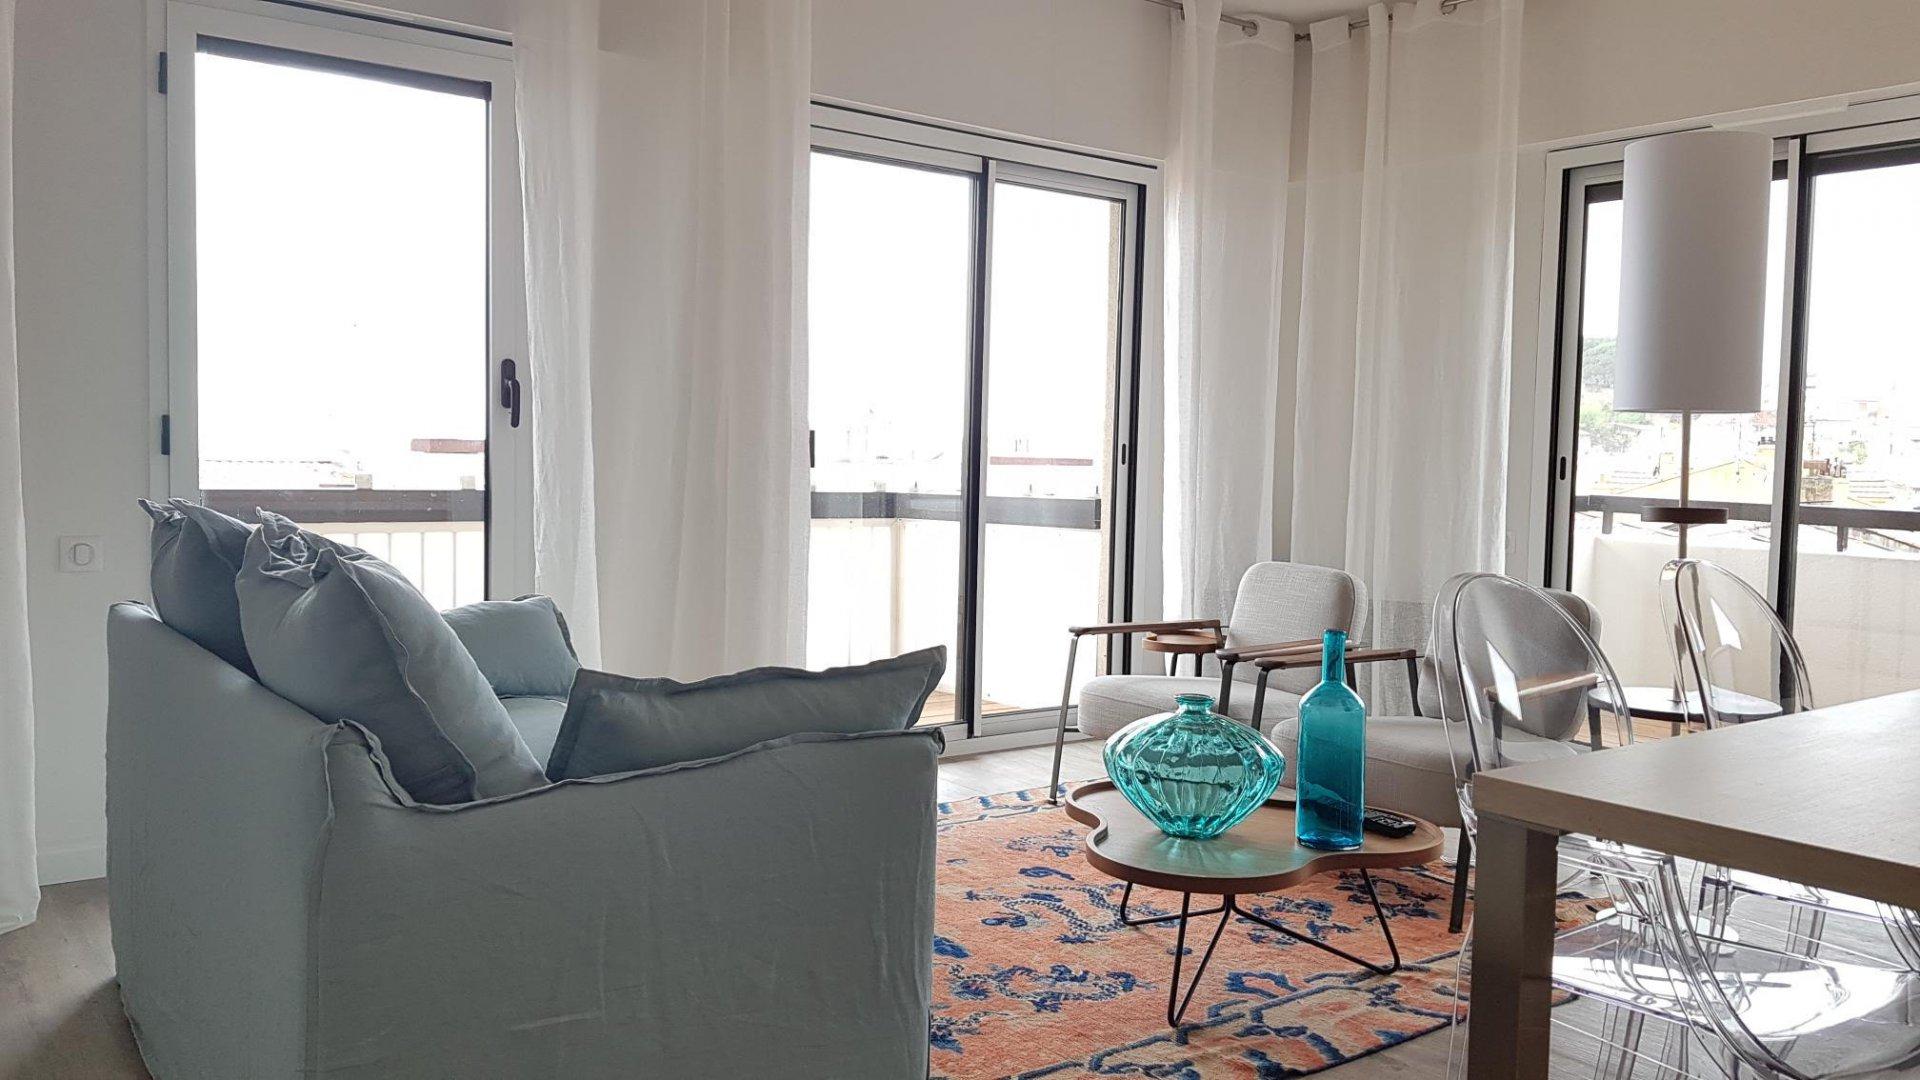 rental 2 bedroom for congress close Palais